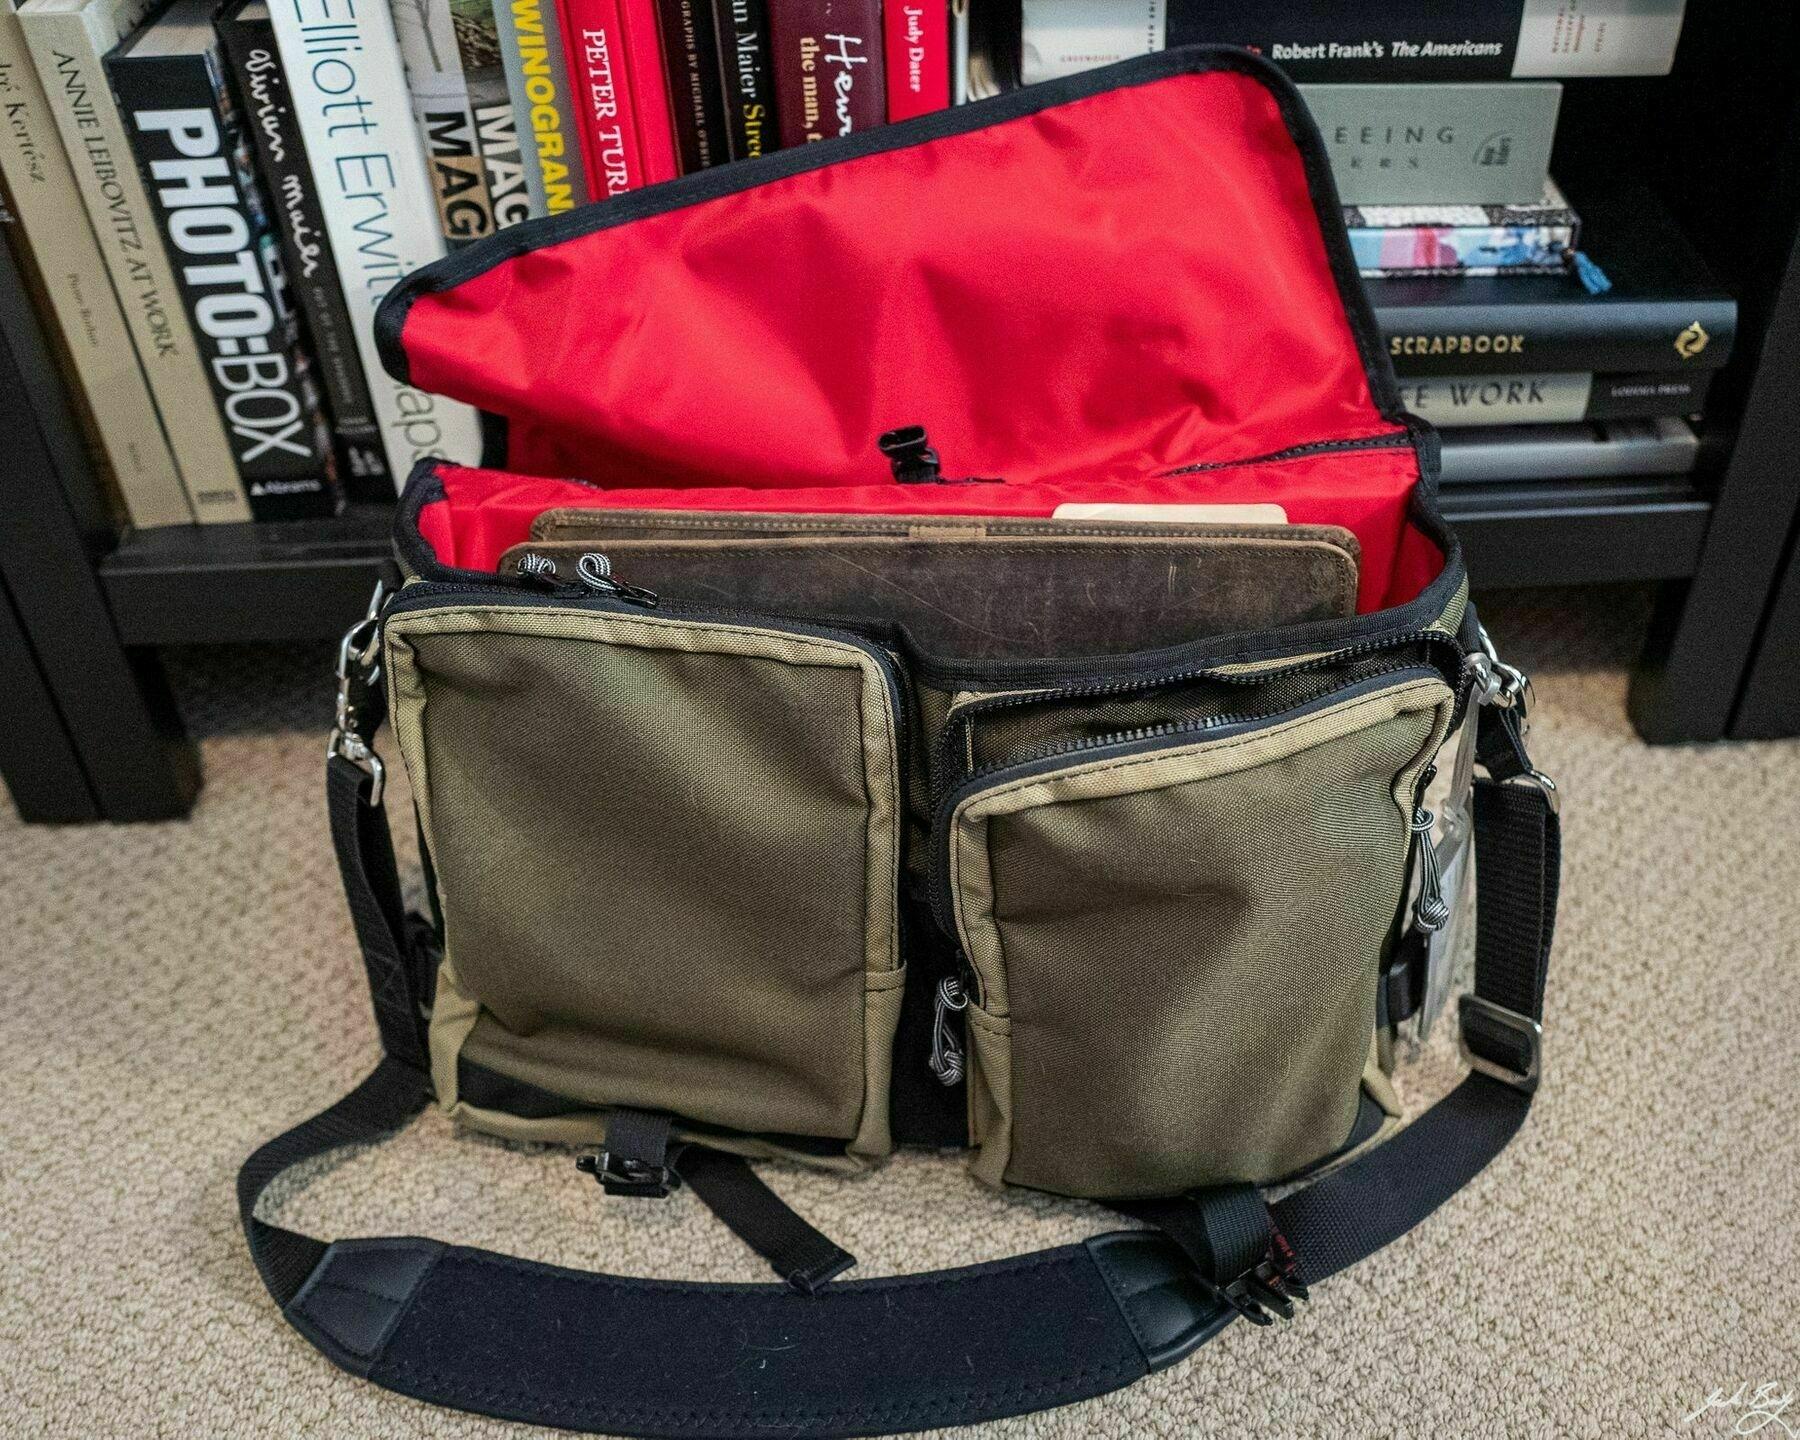 C.C. Rider bag, unposed, on my home office floor.